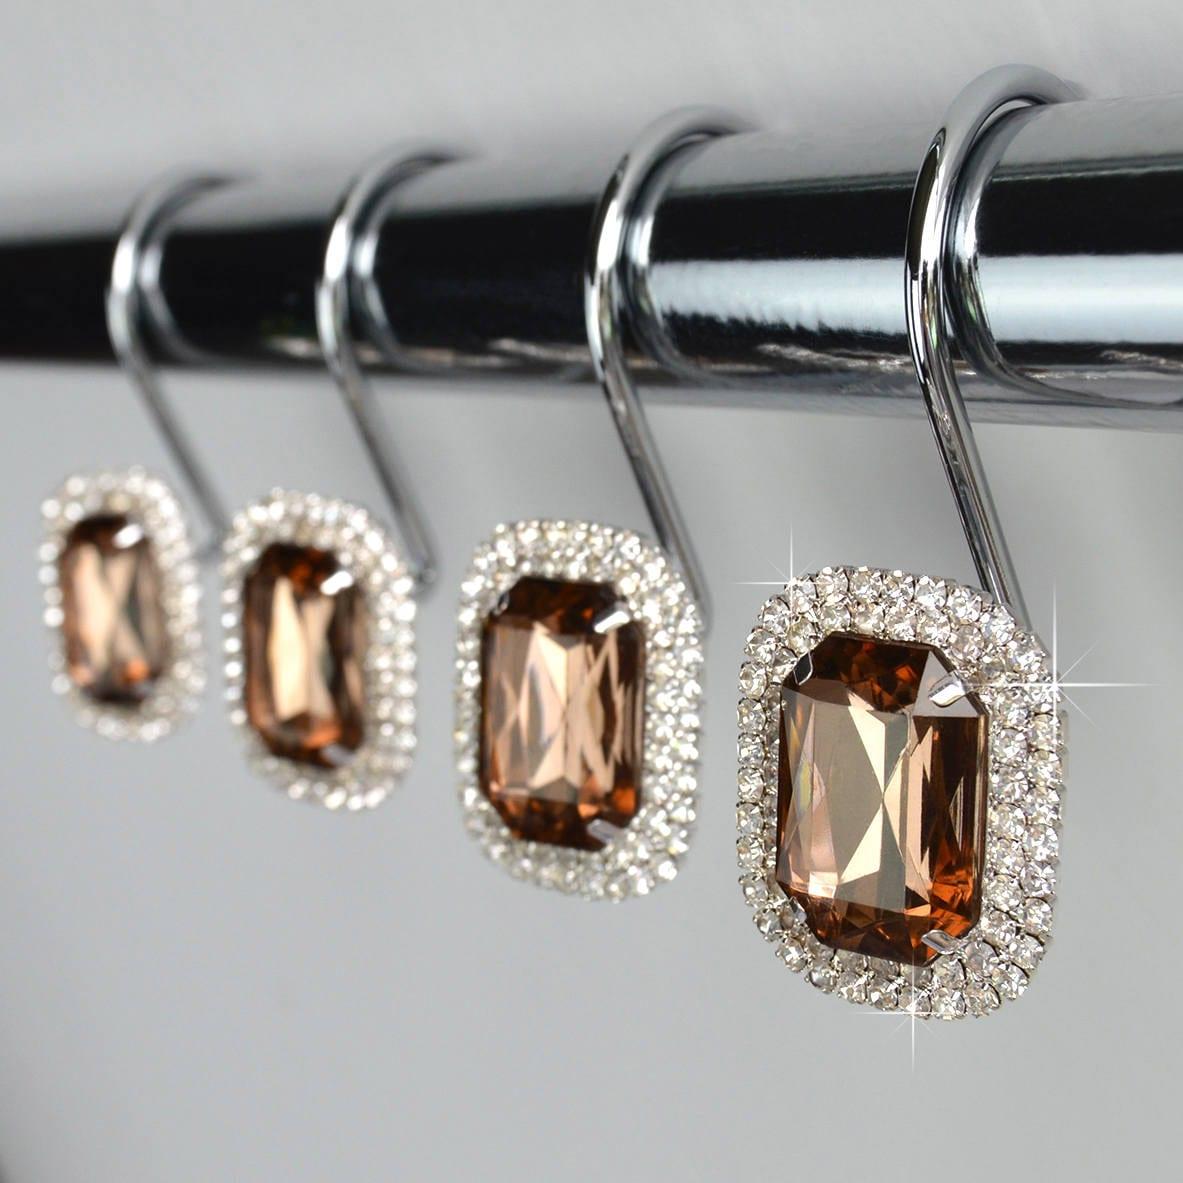 Shower Curtain Hooks Rings Luxurious Brown Decorative Crystal Diamond Bling Rhinestones Bathroom Bath Set Women Girls Gift